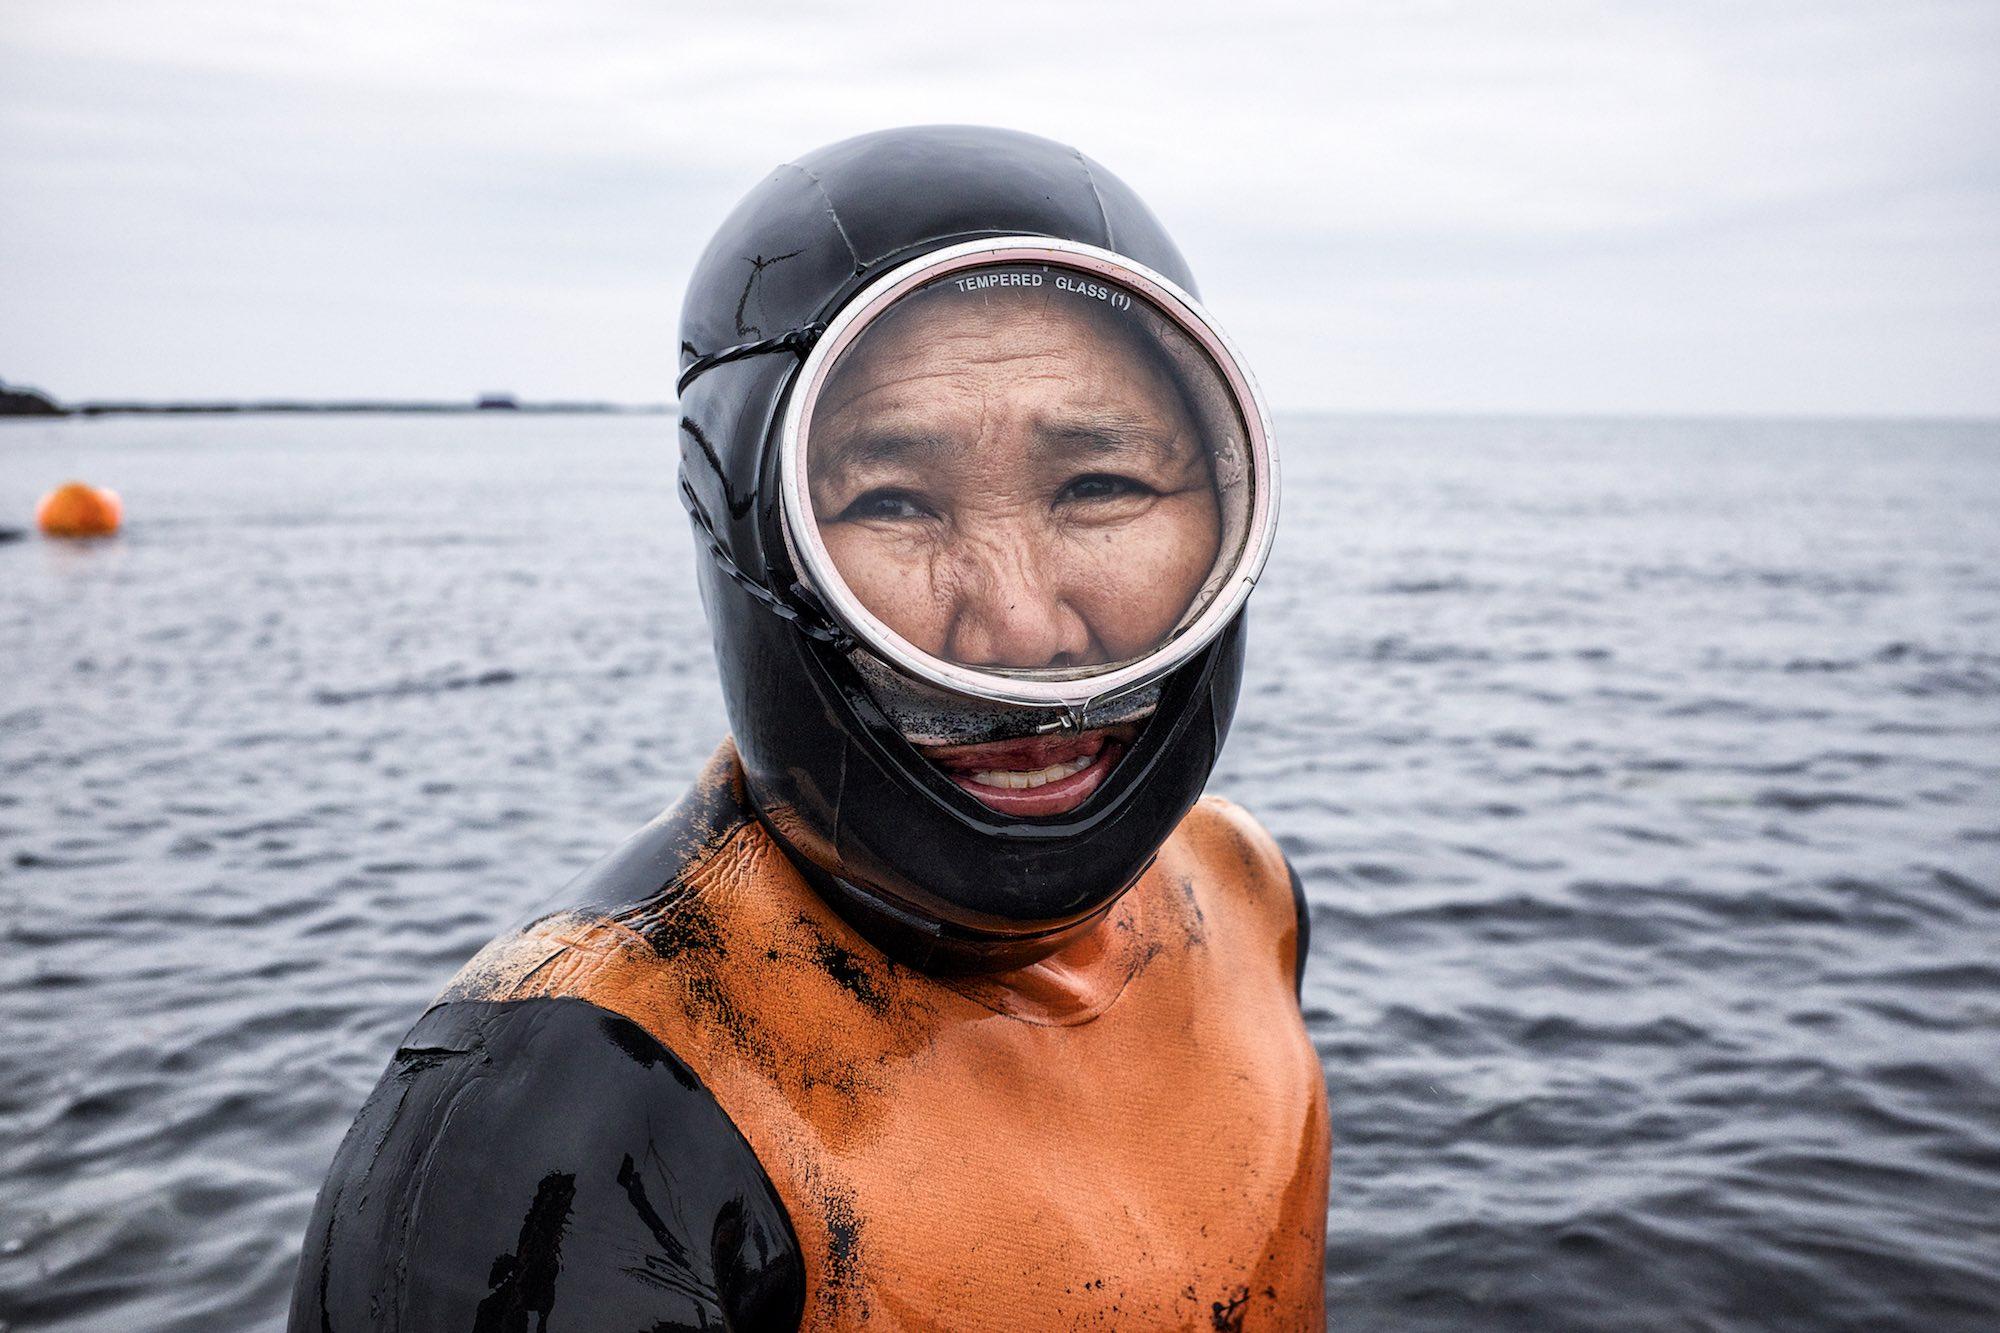 Haenyeo Women Divers Sea Jeju Island South Korea Documentary Photography 2